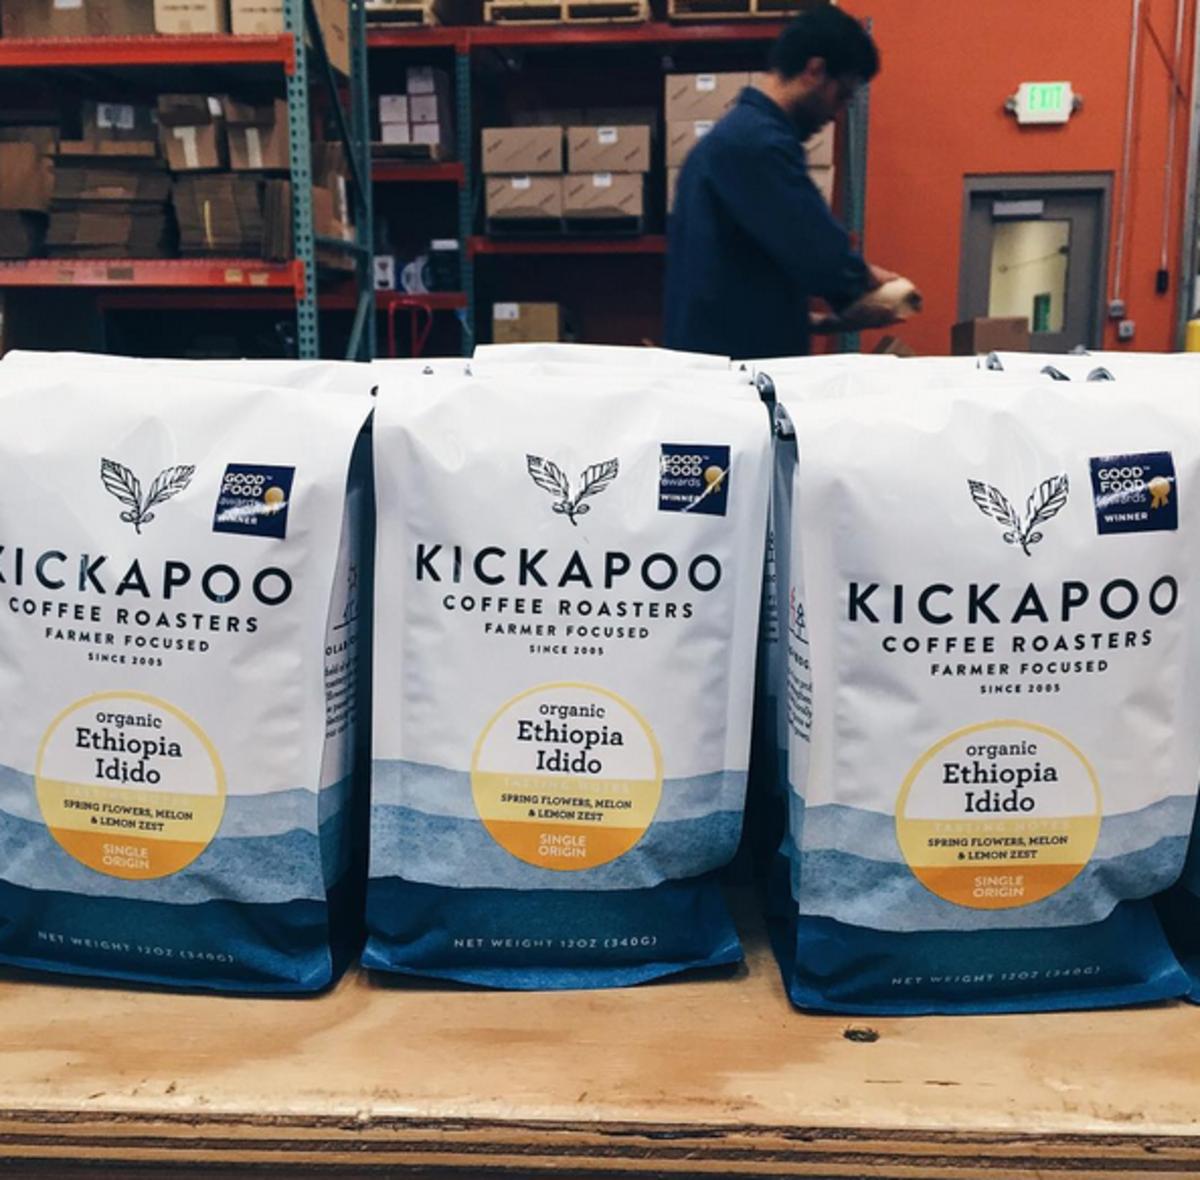 Kickapoo knows conscious coffee.